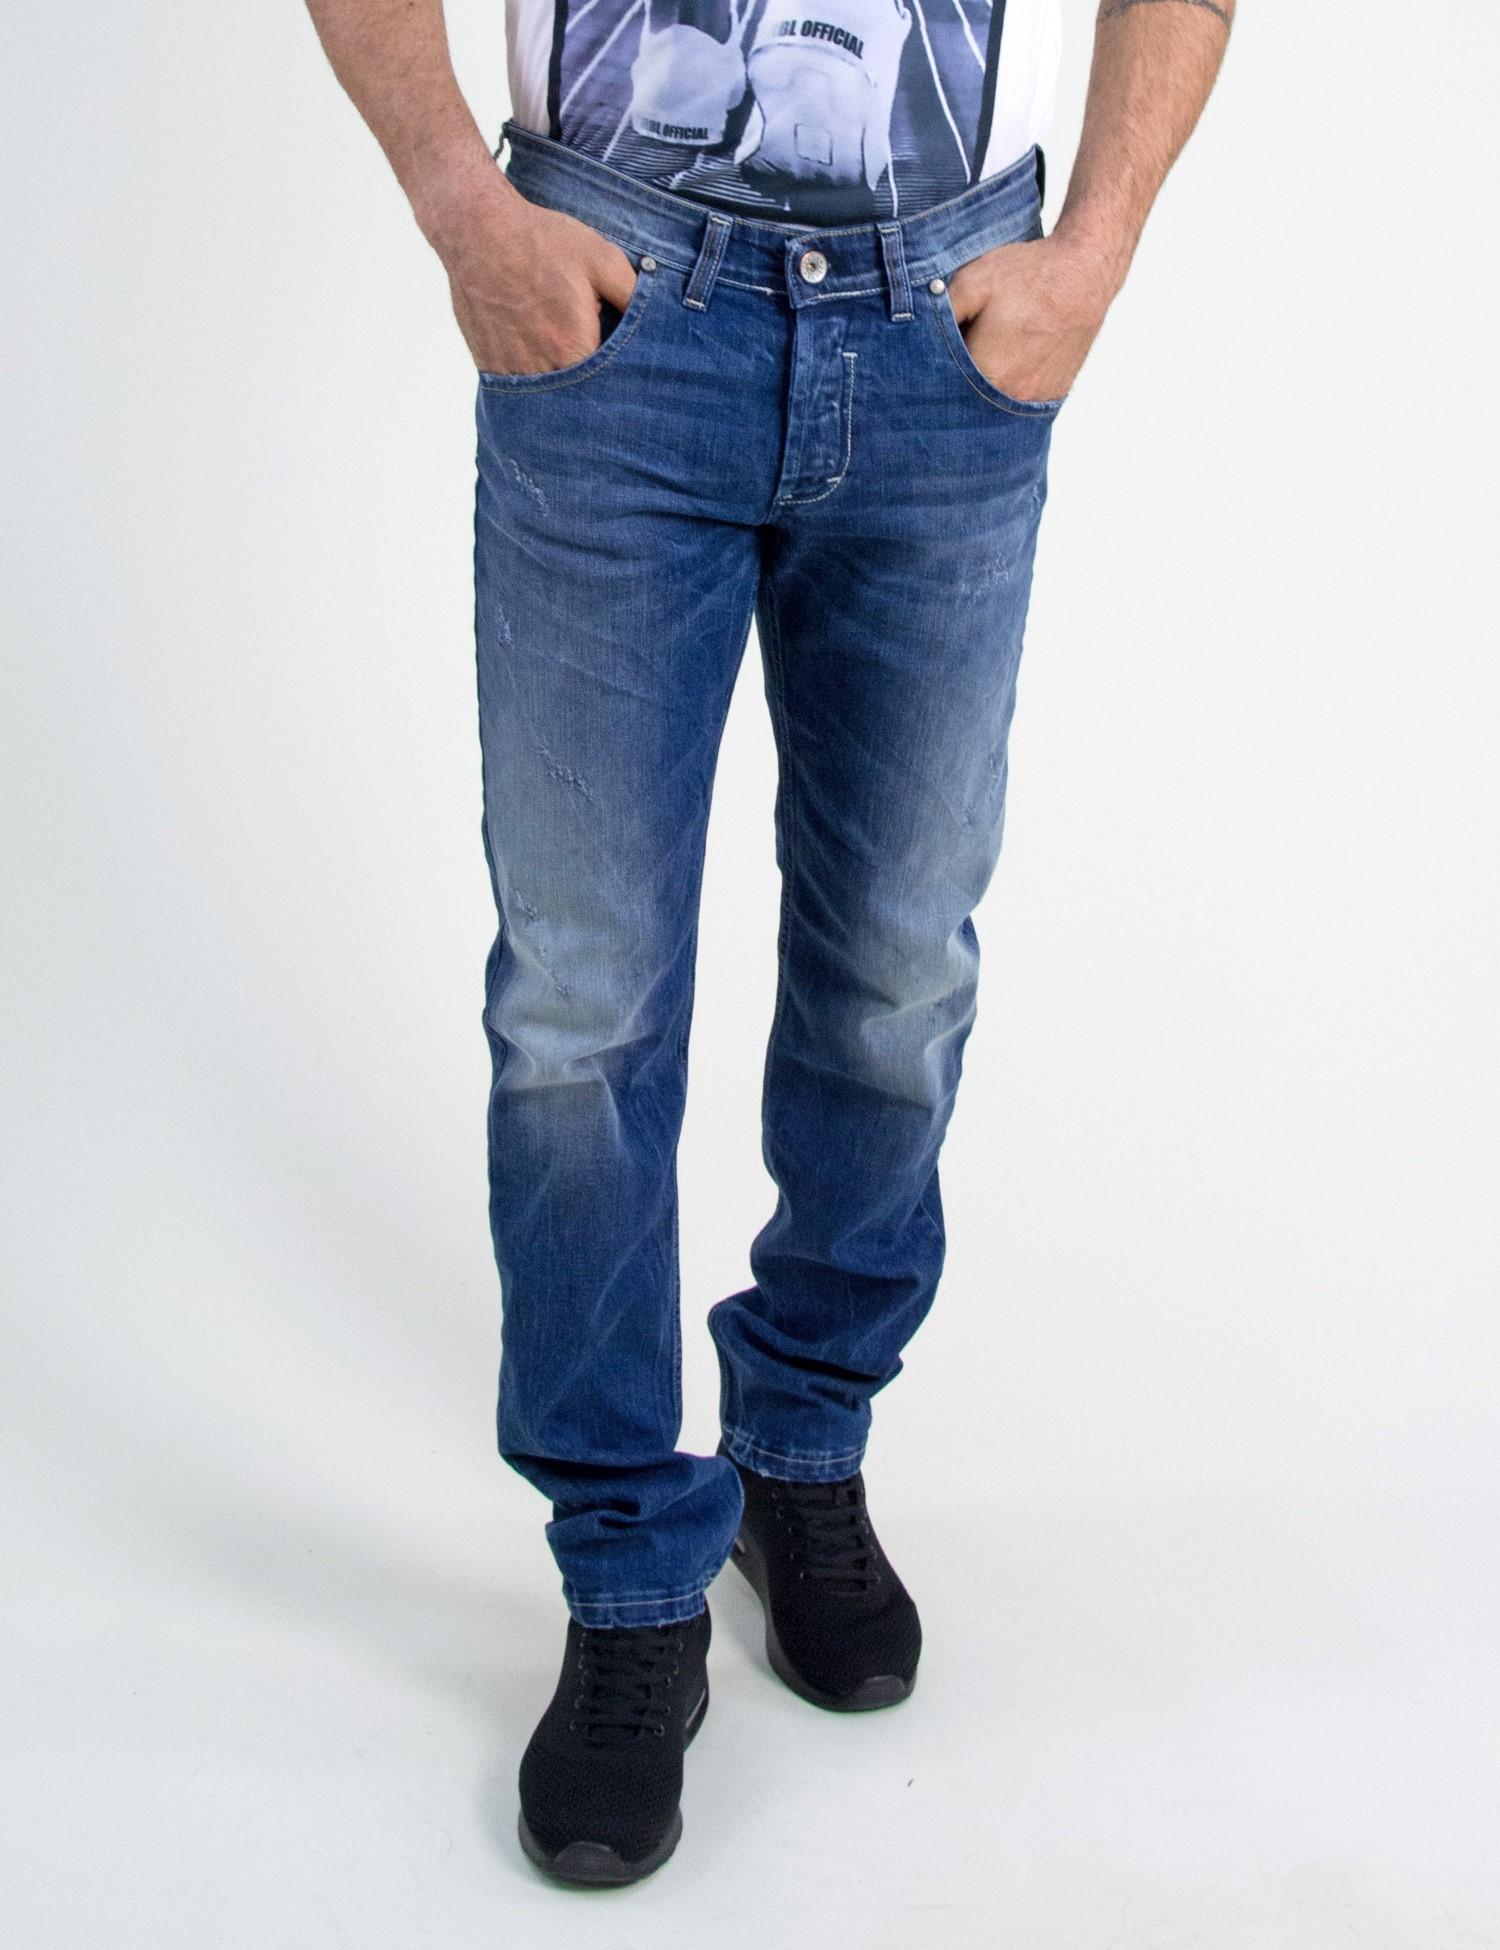 9aa6deb2c789 Ανδρικό τζην παντελόνι Trial μπλε ανοιχτό με ξεβάμματα MarvinC